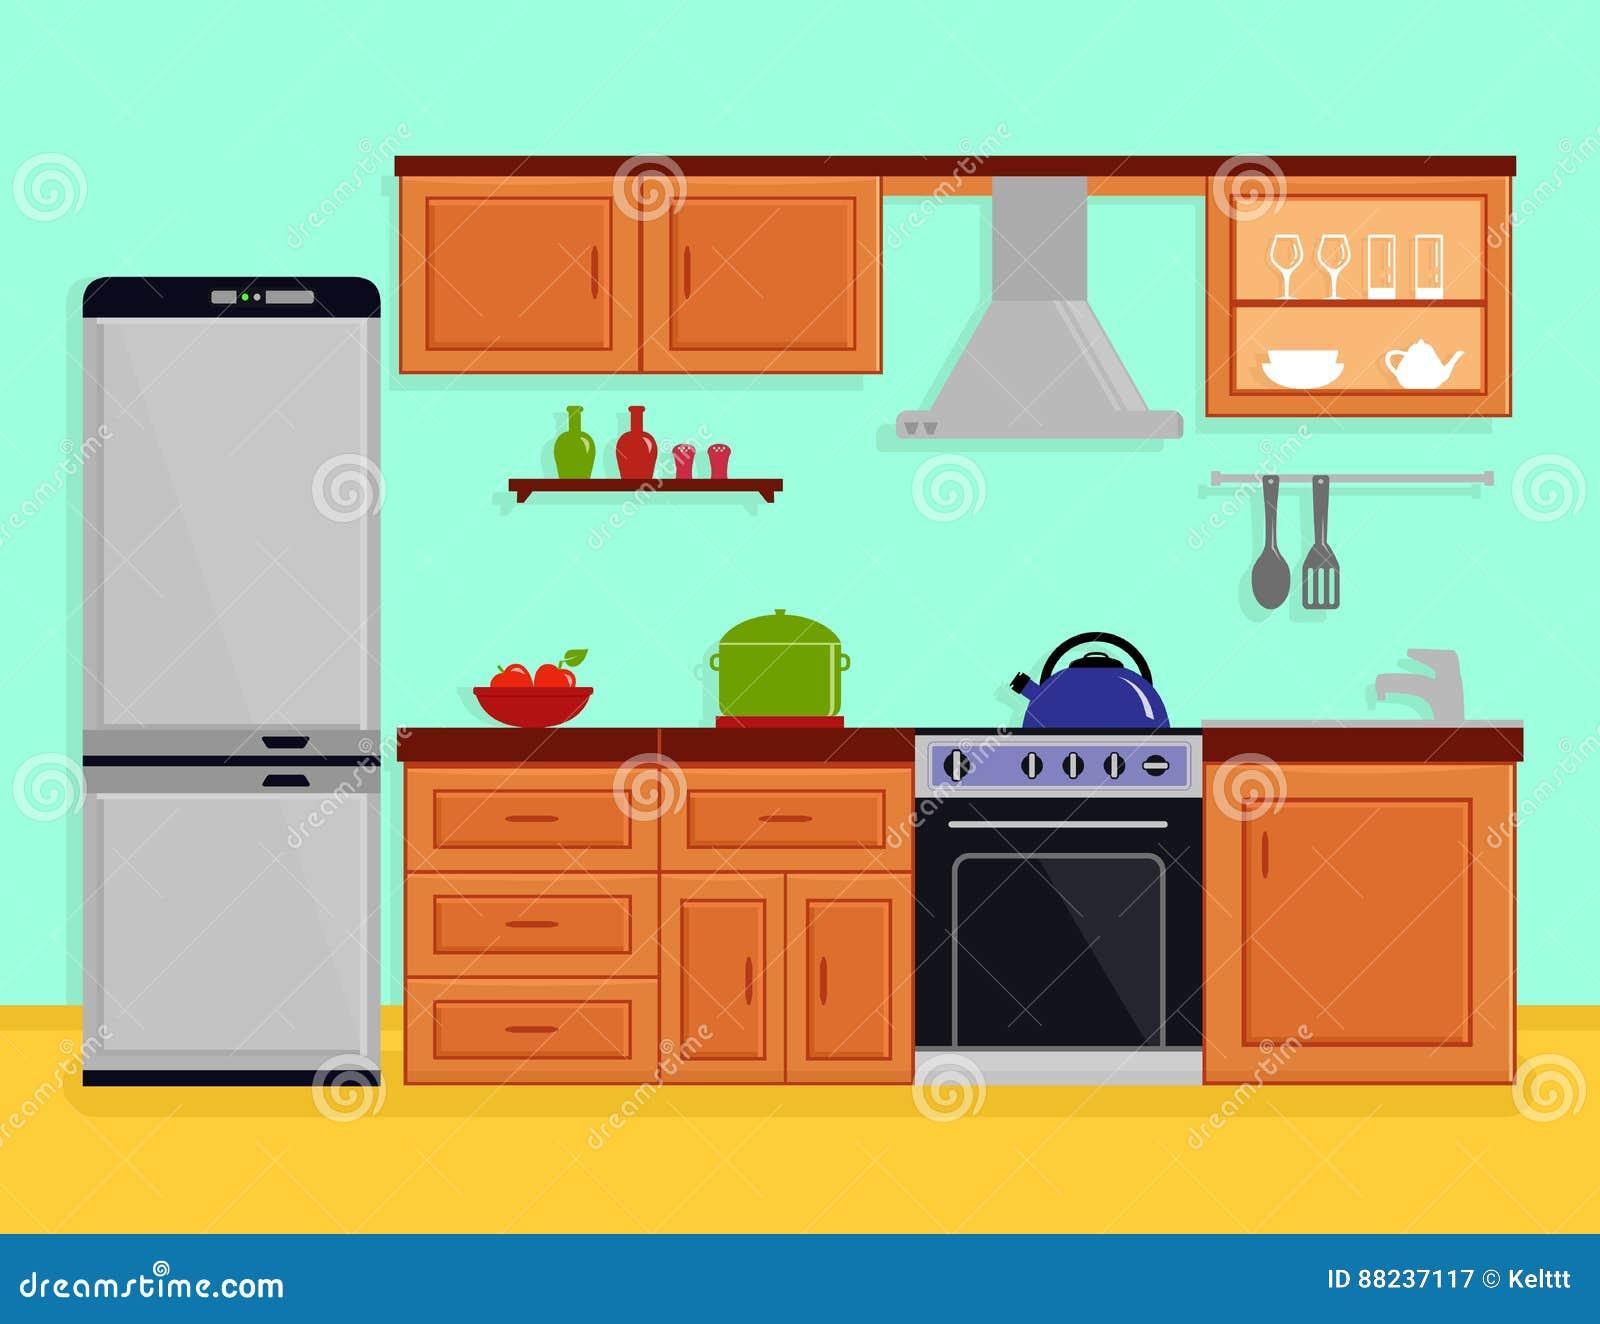 Kitchen Interior With Kitchen Room Furniture Stock Vector ...